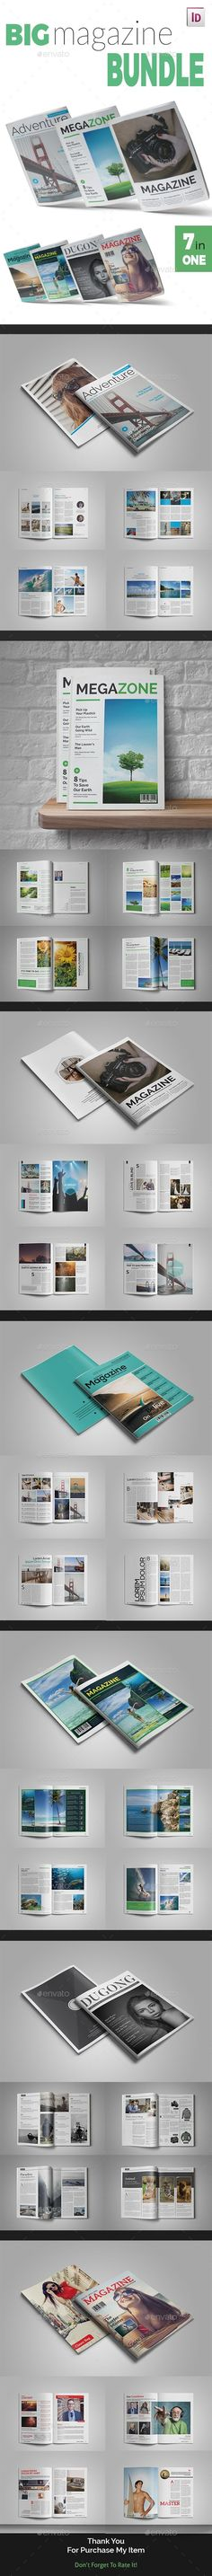 Magazines Bundle - Magazines Print Templates Download here : https://graphicriver.net/item/magazines-bundle/19489944?s_rank=68&ref=Al-fatih